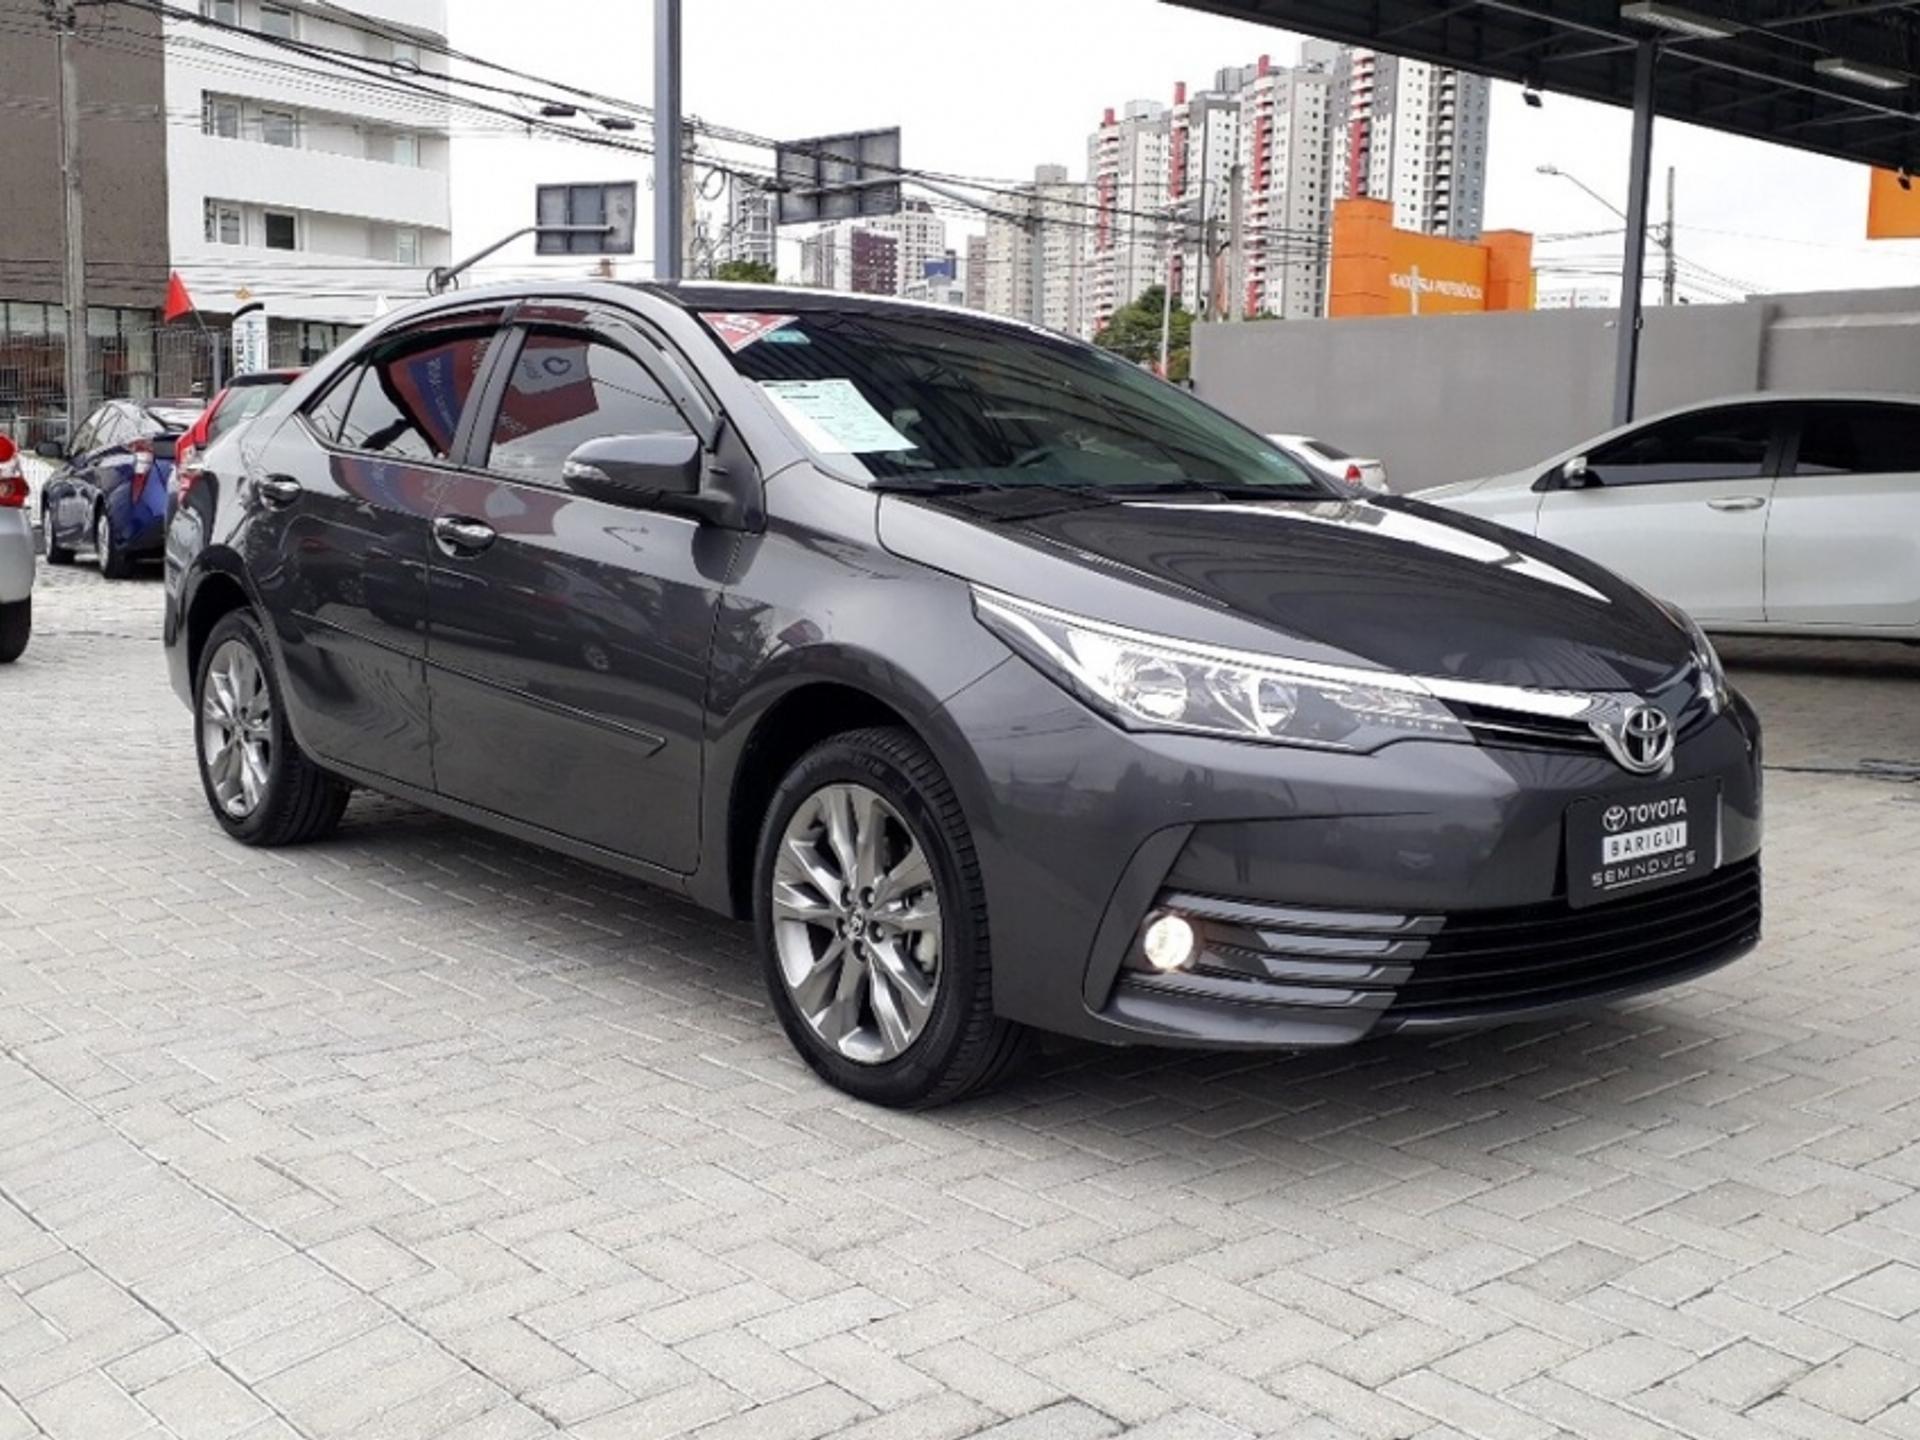 Toyota Corolla 2.0 Xei 16v Flex 4p Automatico Wmimagem12445365564